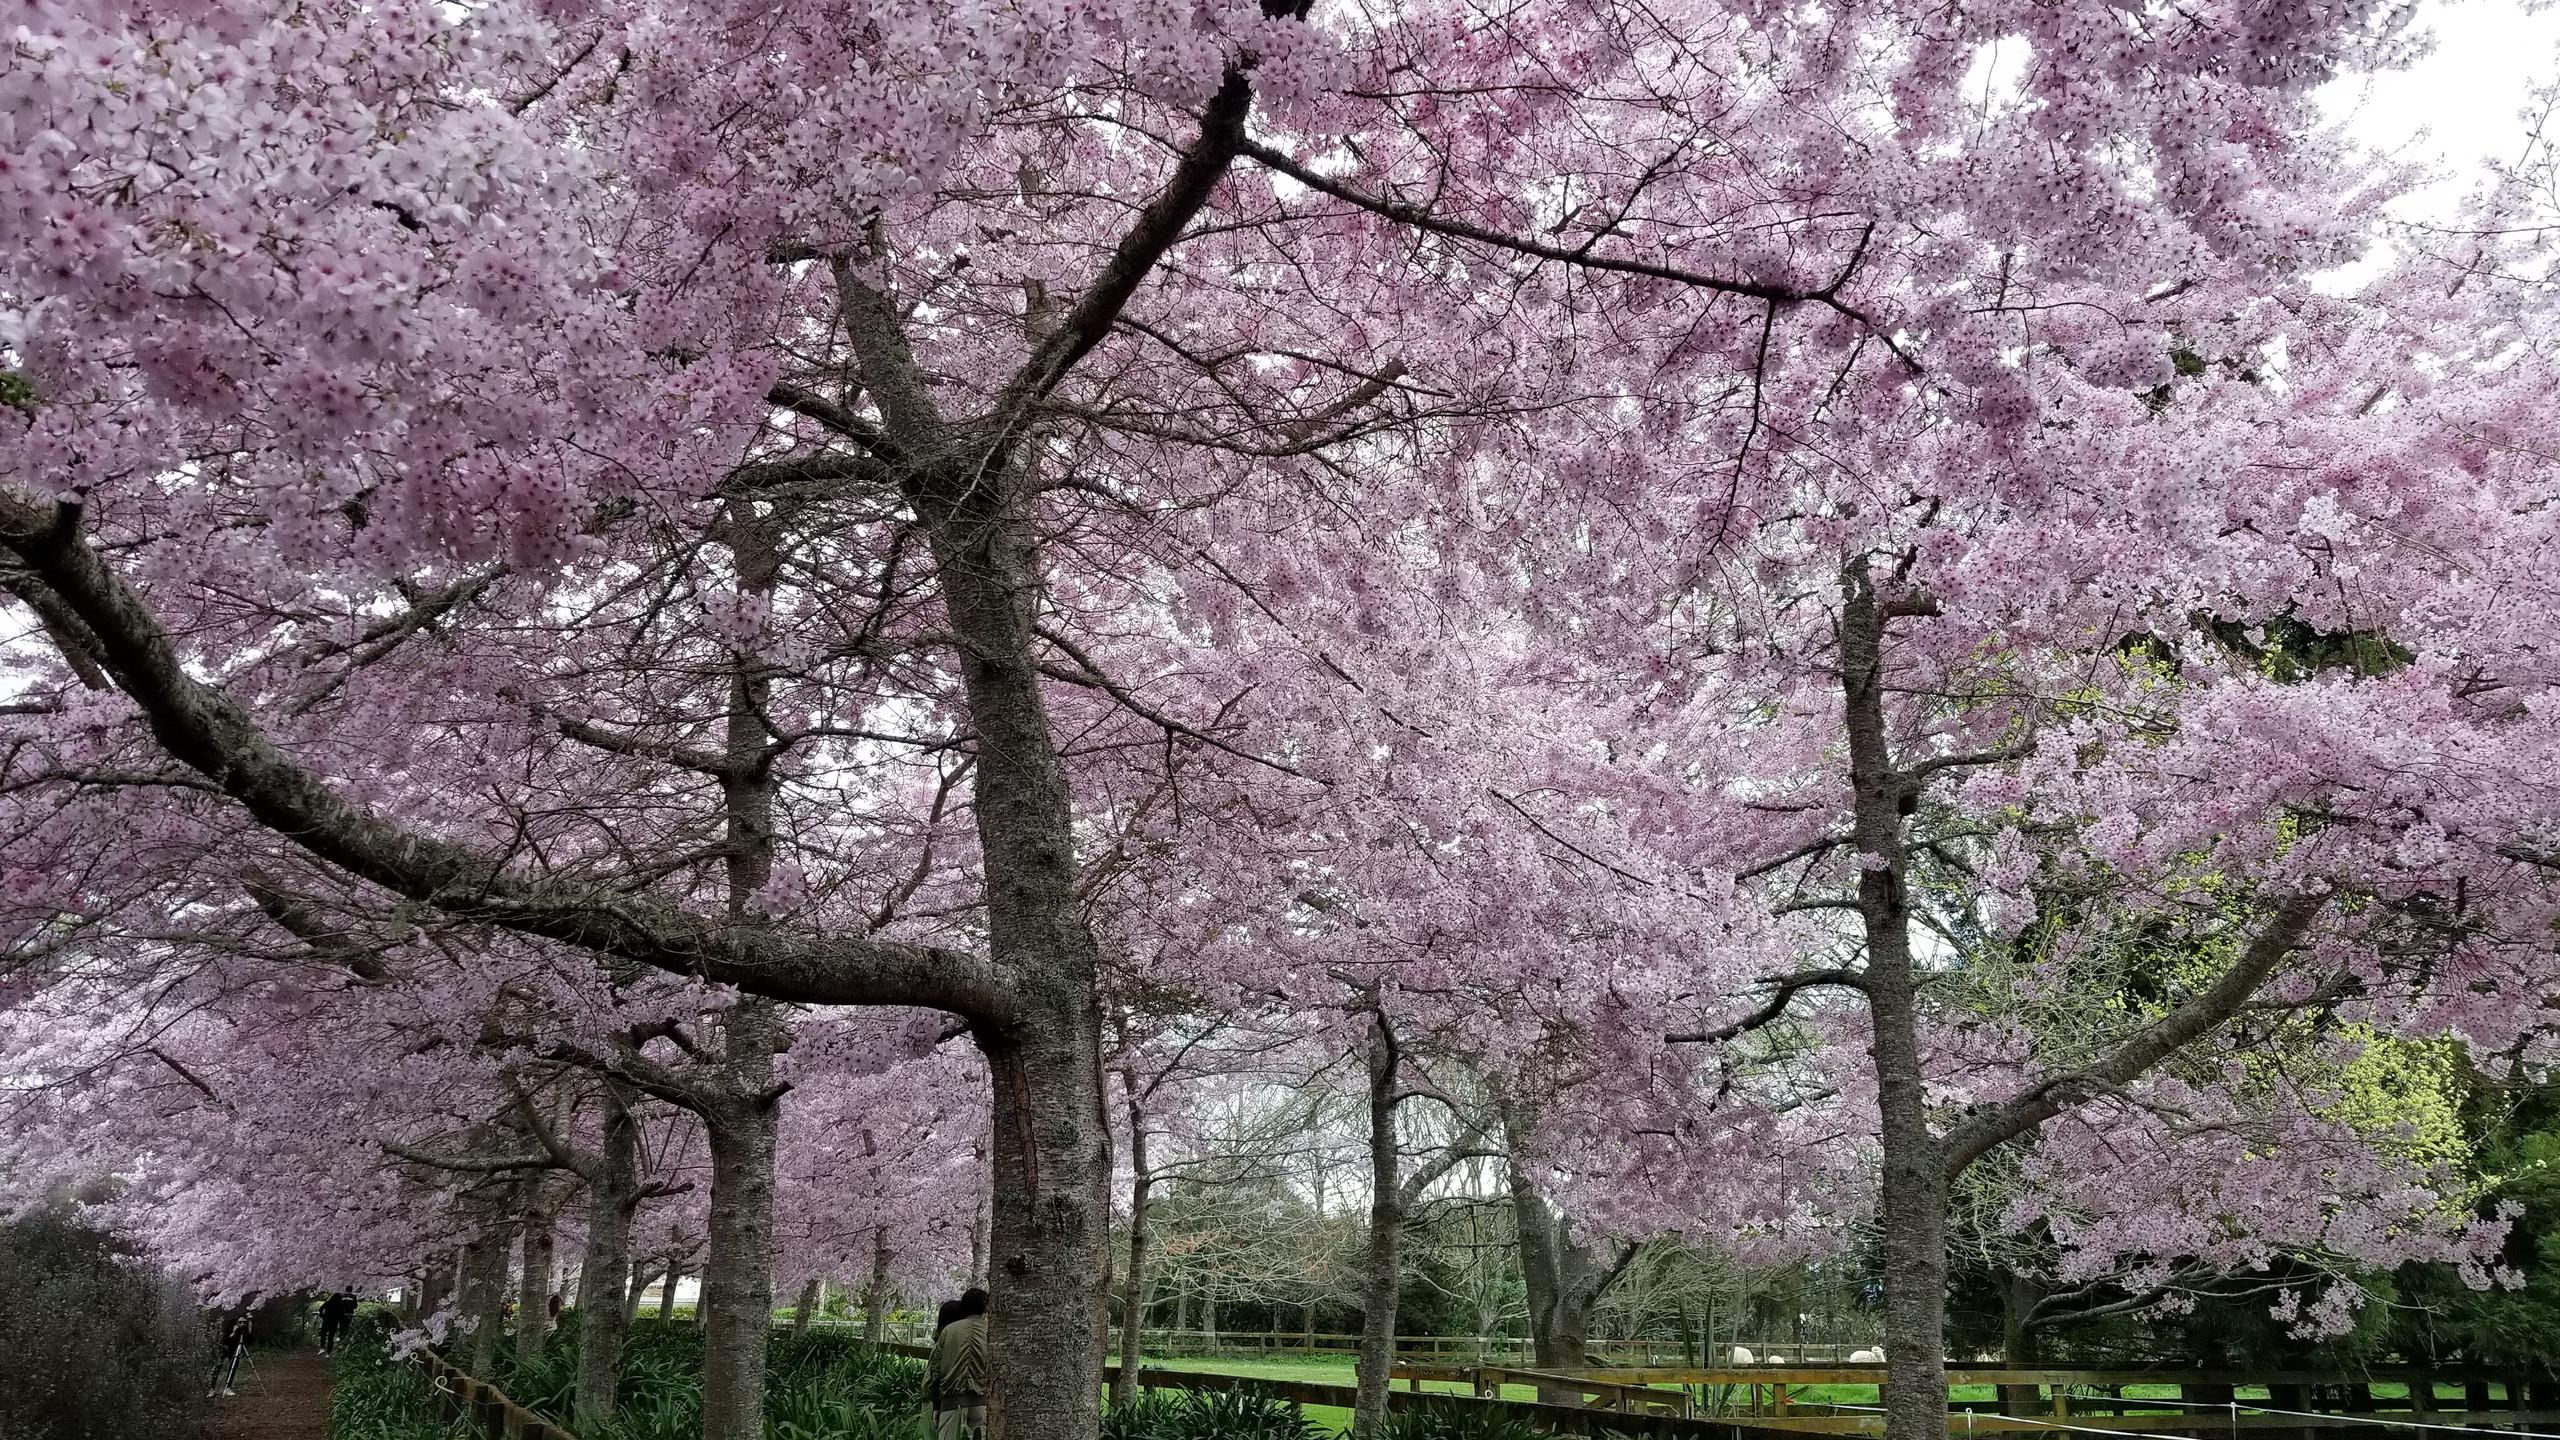 Cherry blossom festival, Hamilton, New Zealand attractions, New Zealand activities